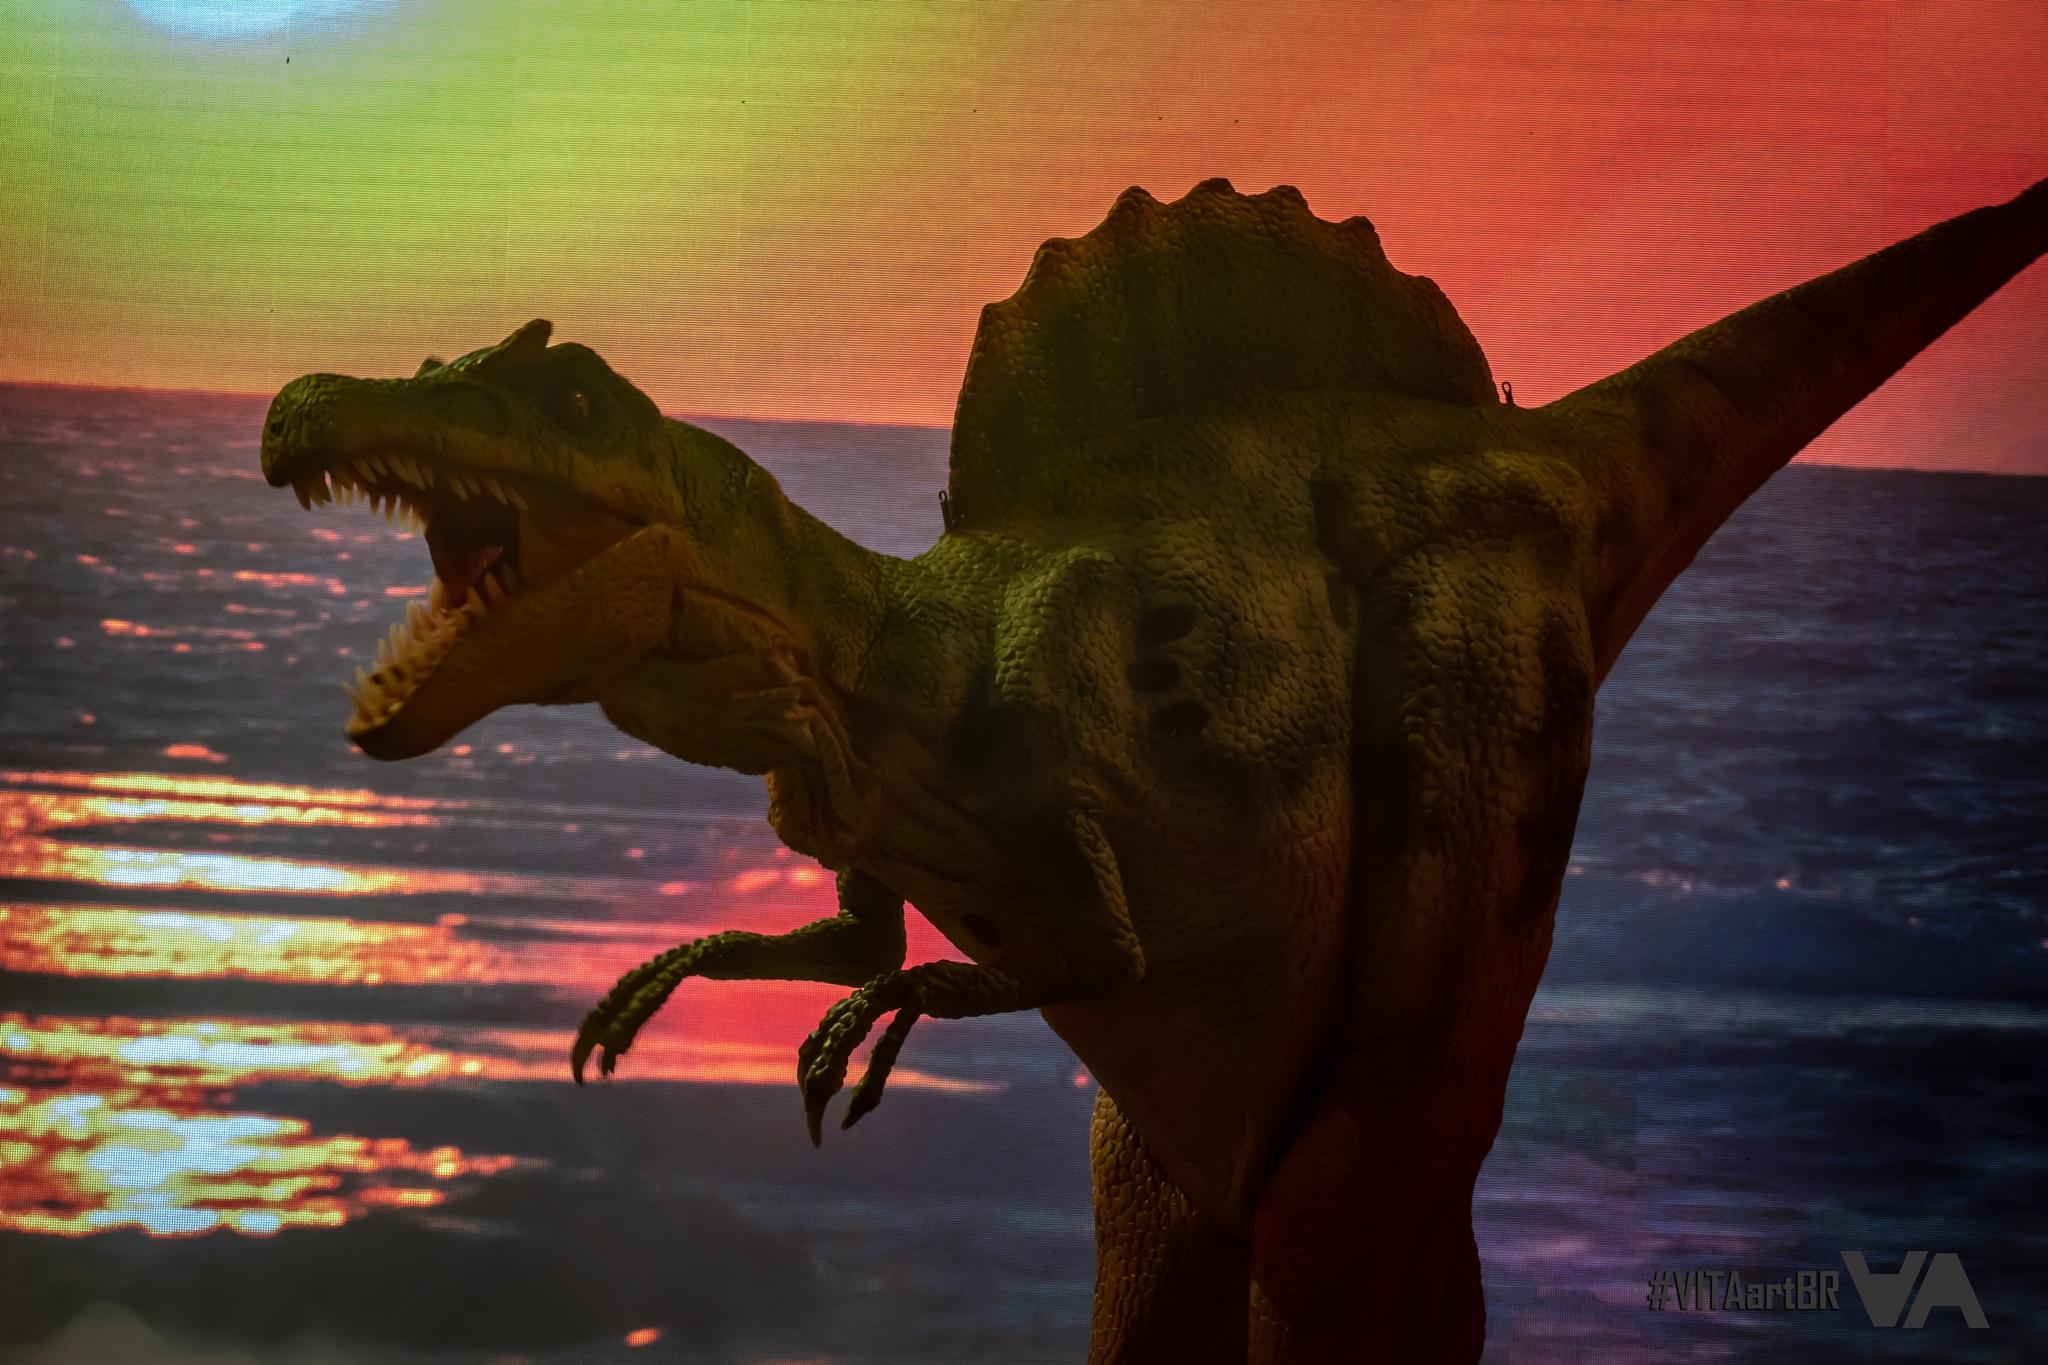 VITAartBR - DinosExperience - 36